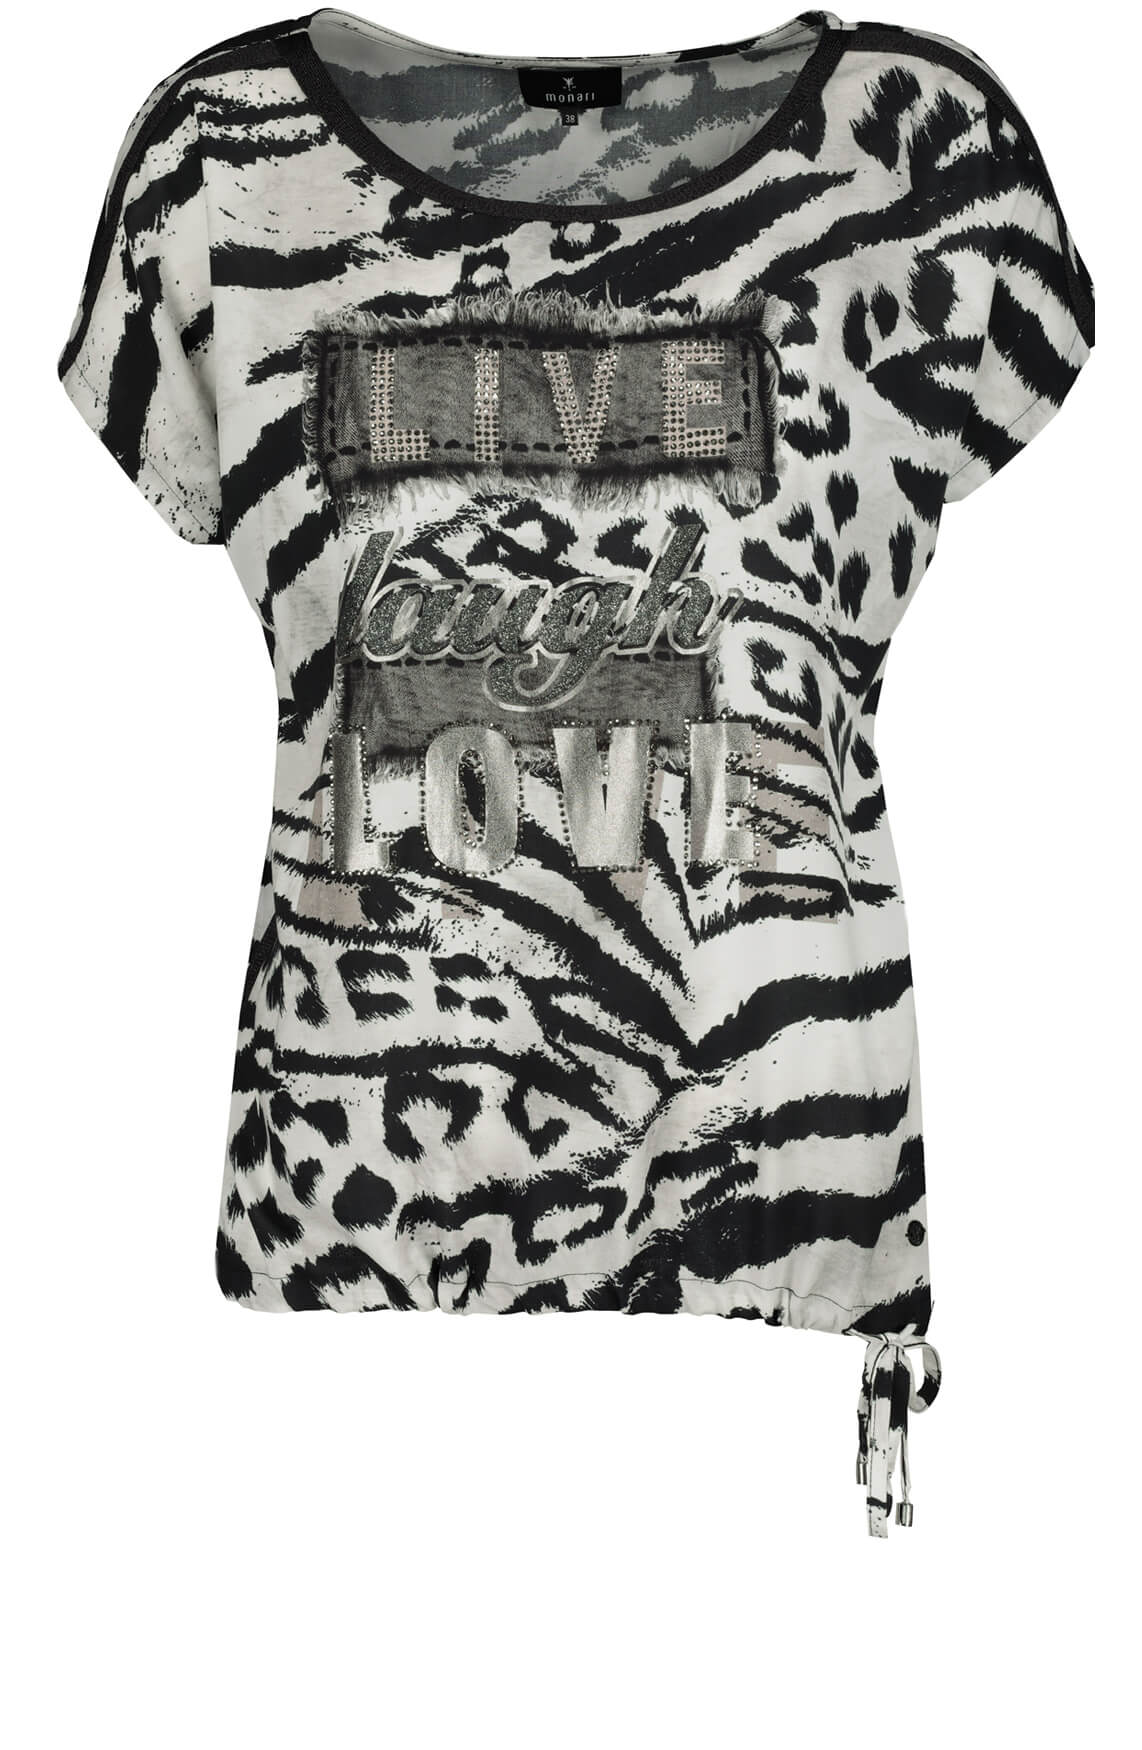 Monari Dames Animalprint shirt zwart